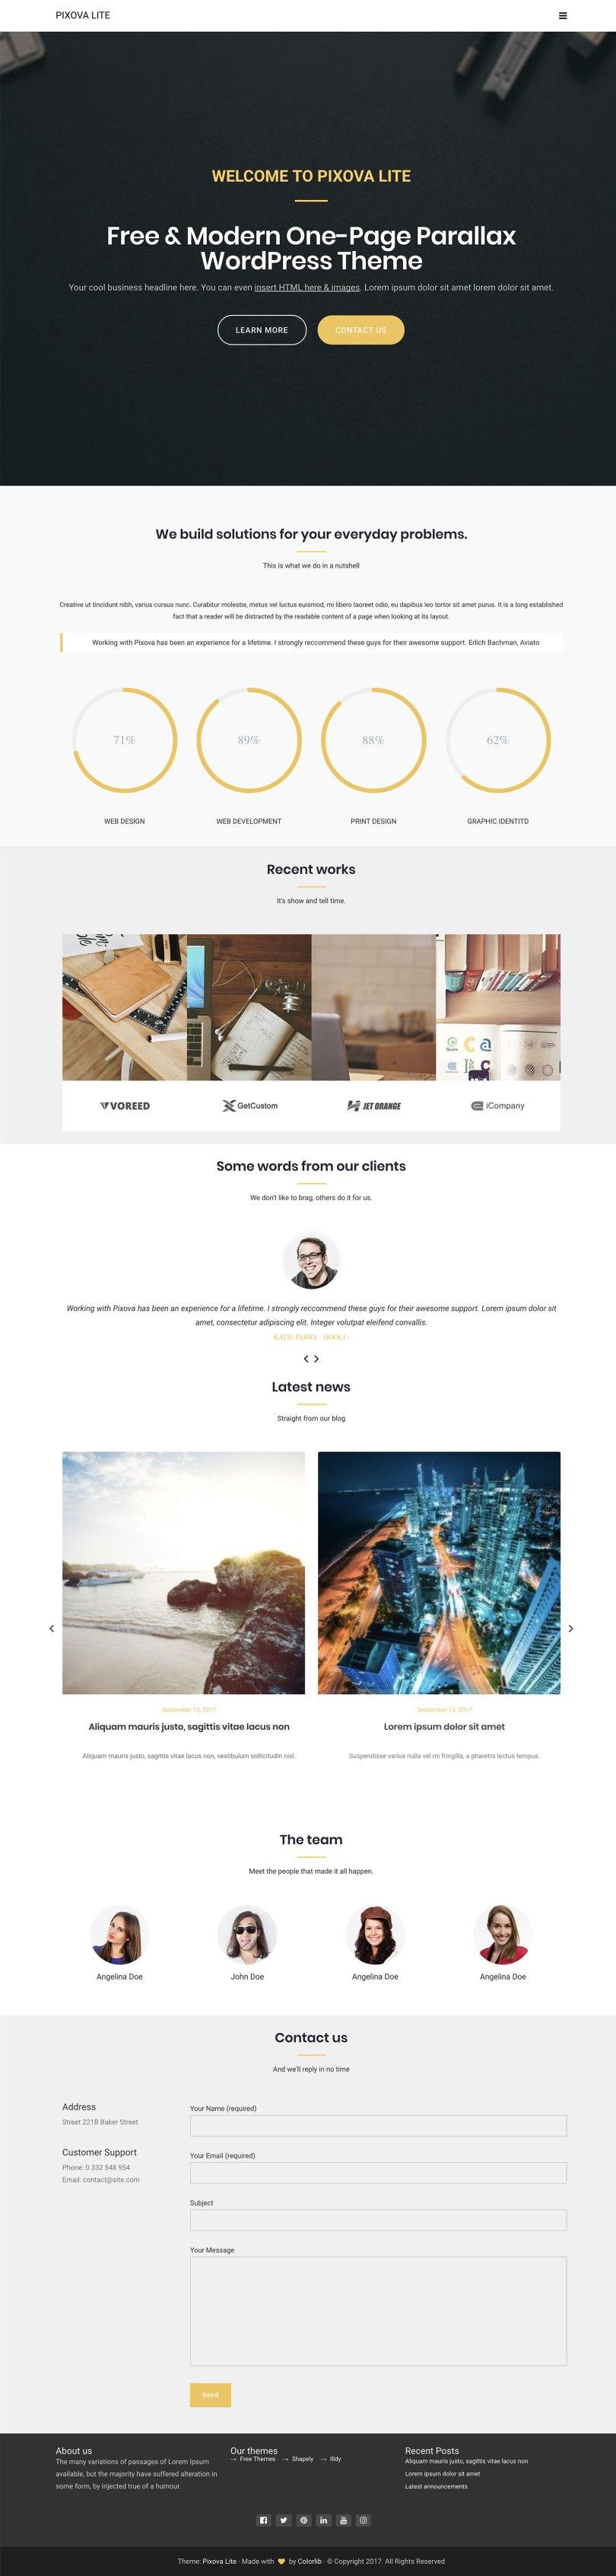 wordpress startup